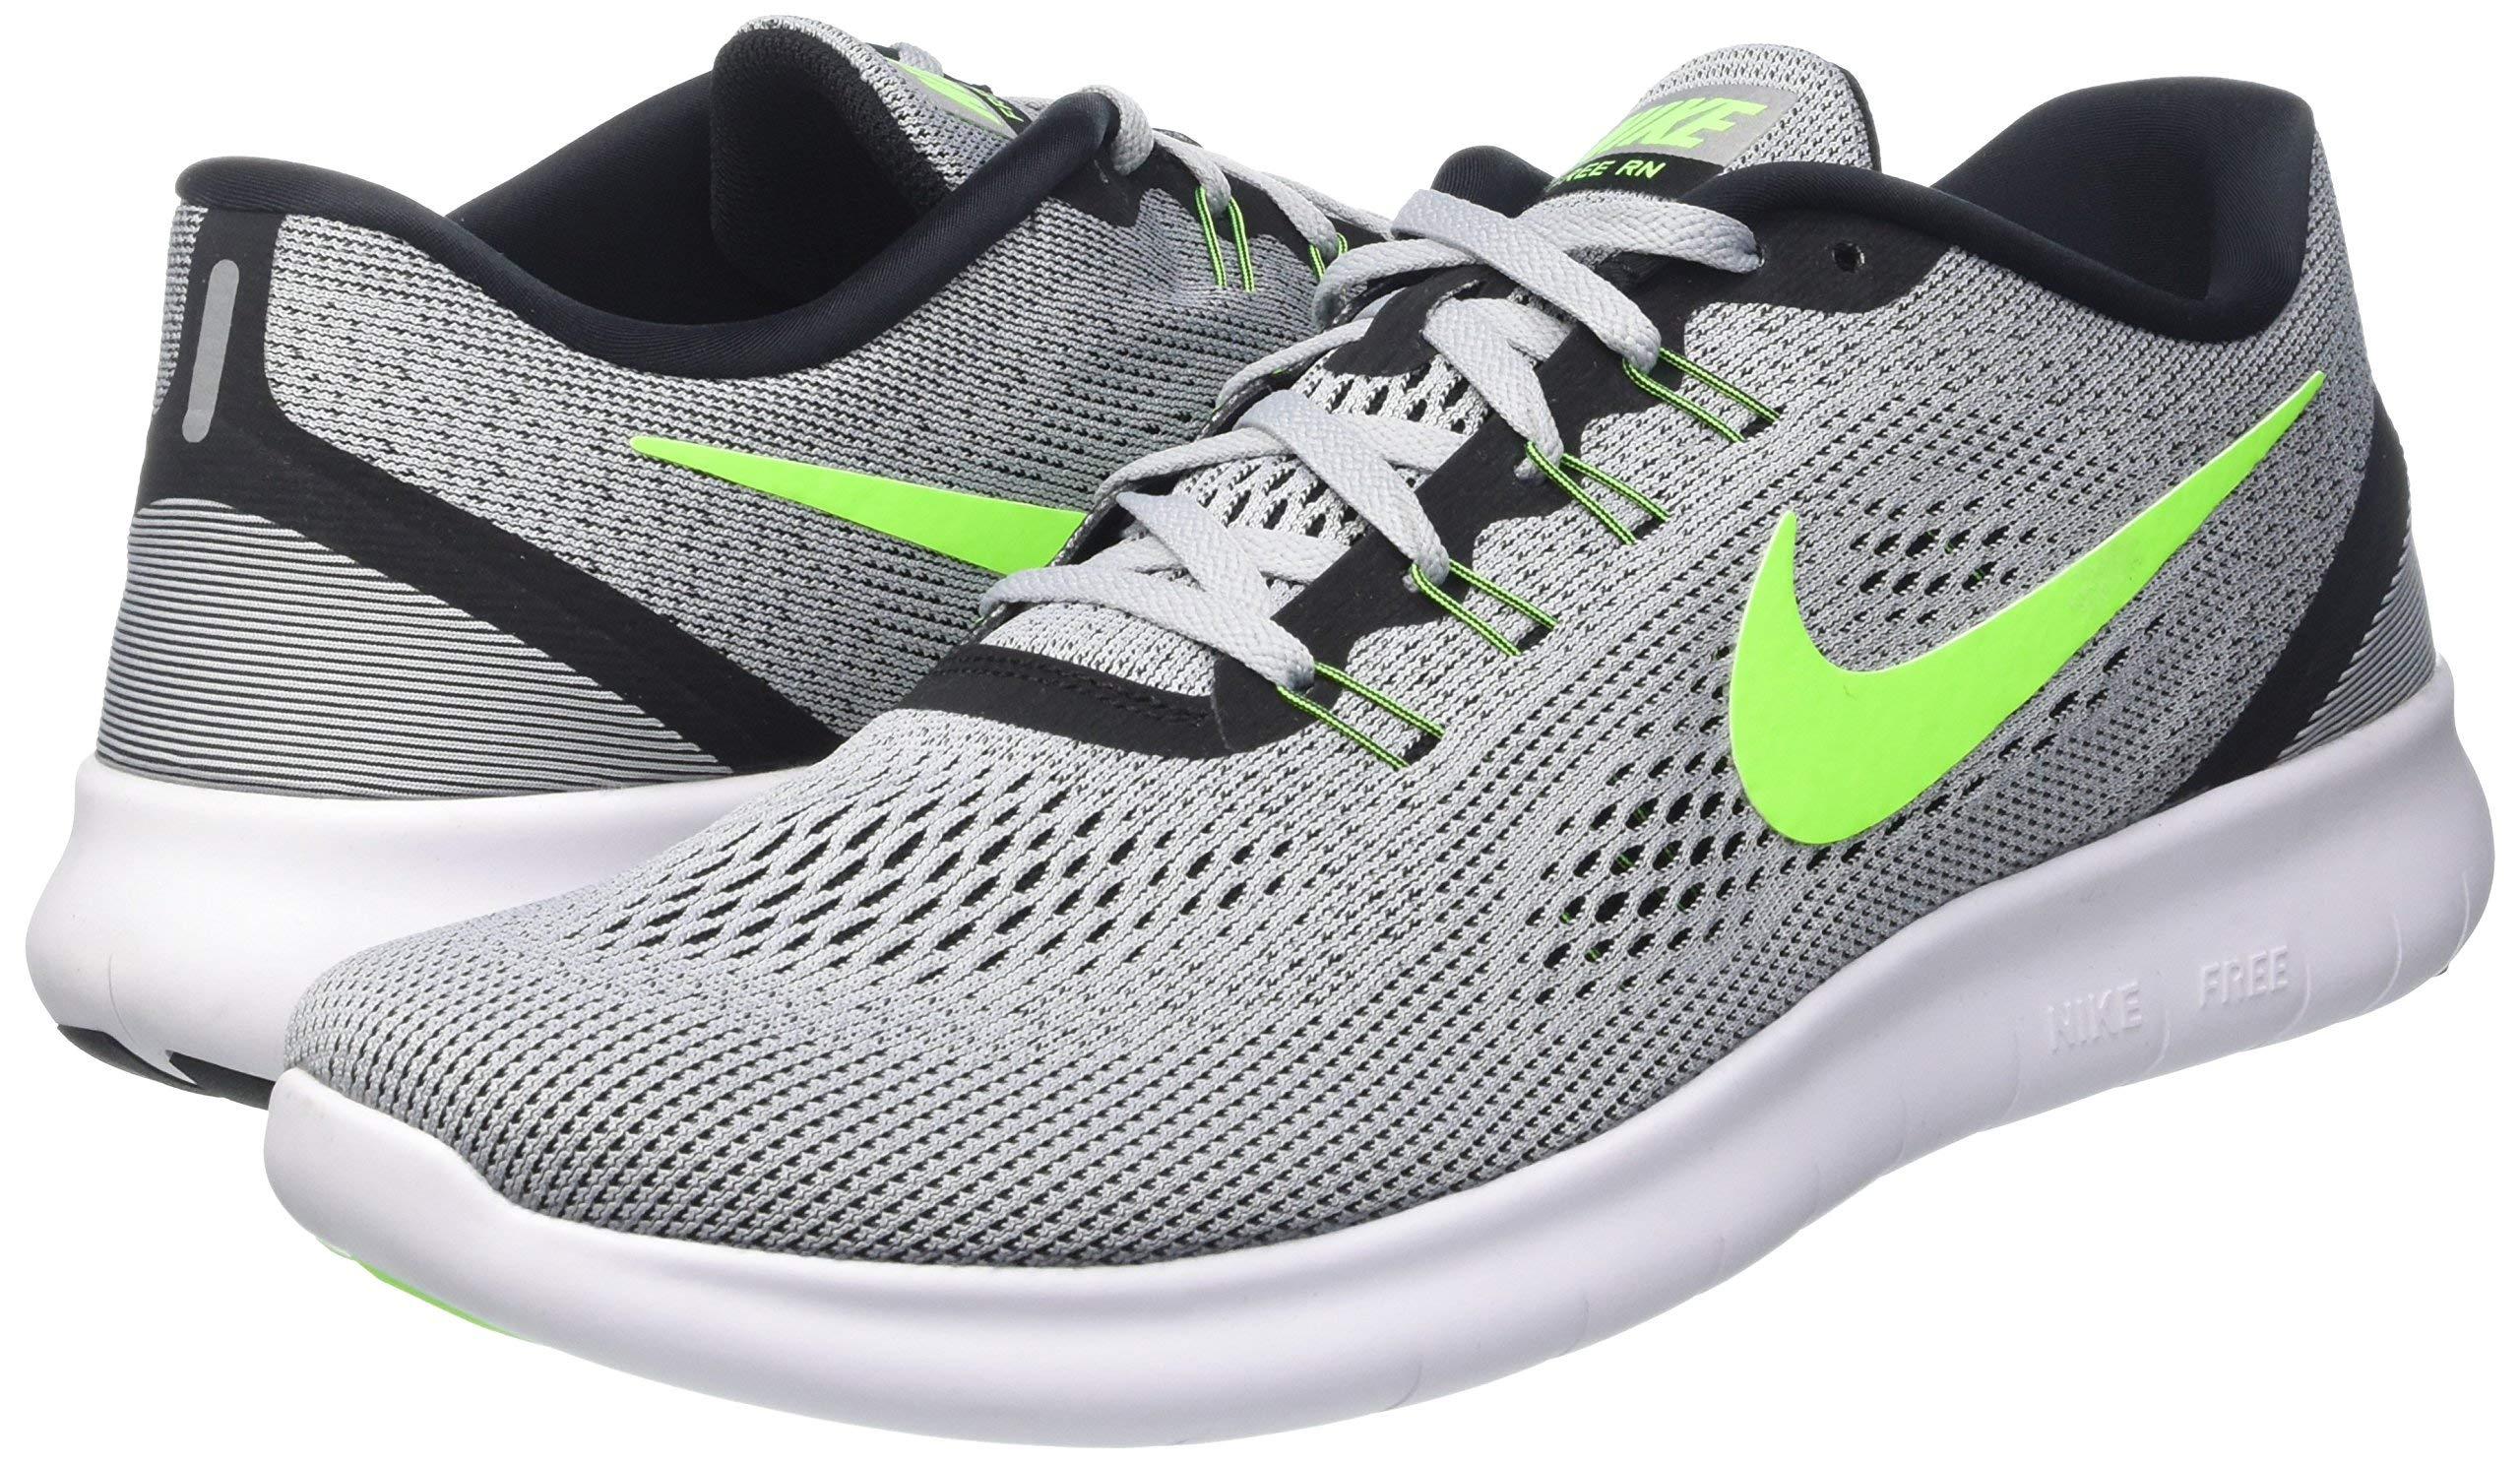 Nike Mens Free Rn Pure Platinum/Elctrc Grn/Anthracite Running Shoe 8 Men US by Nike (Image #8)